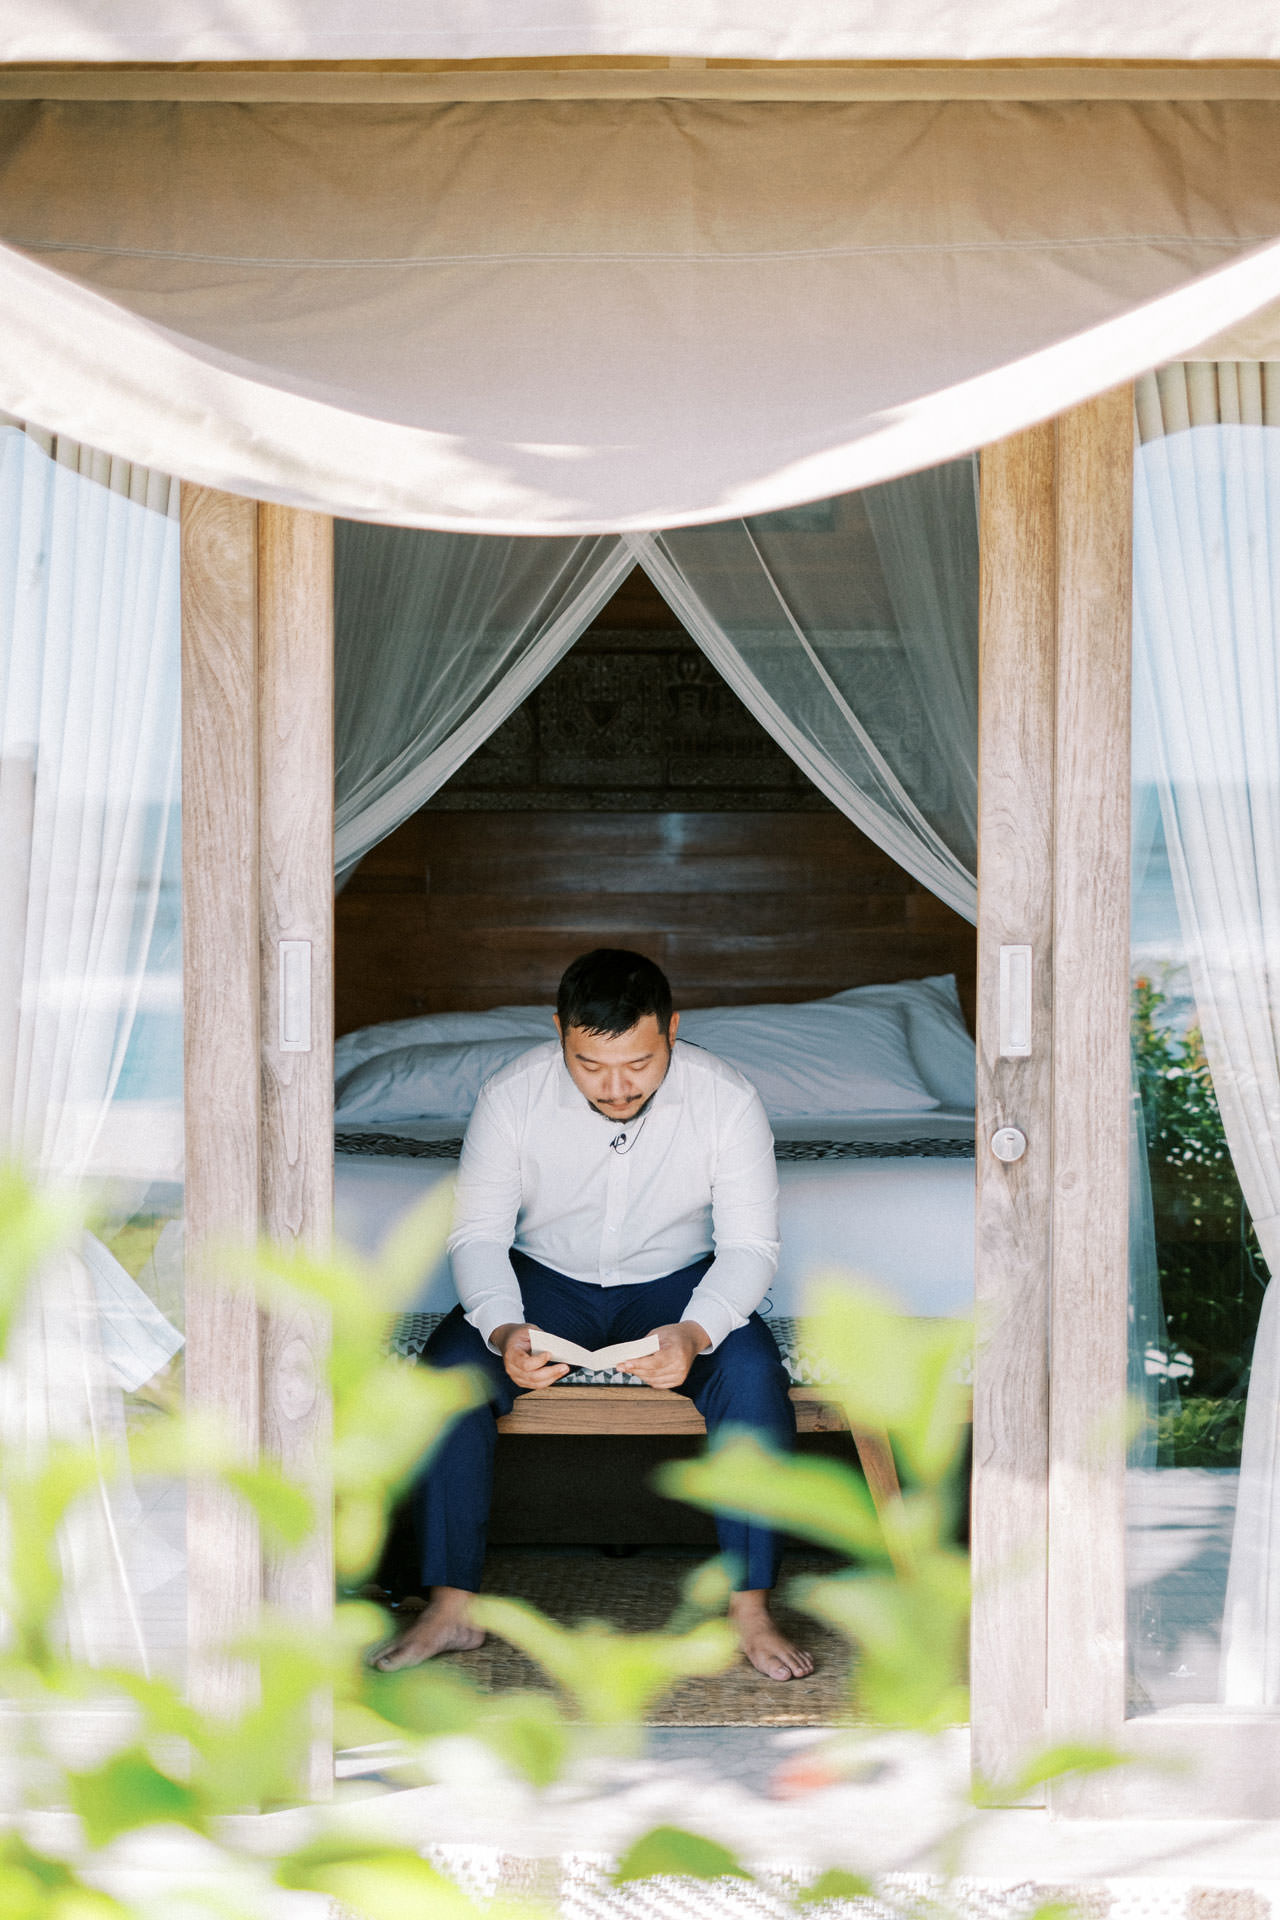 Bali Beach Glamping Wedding on a Luxury Tent 8